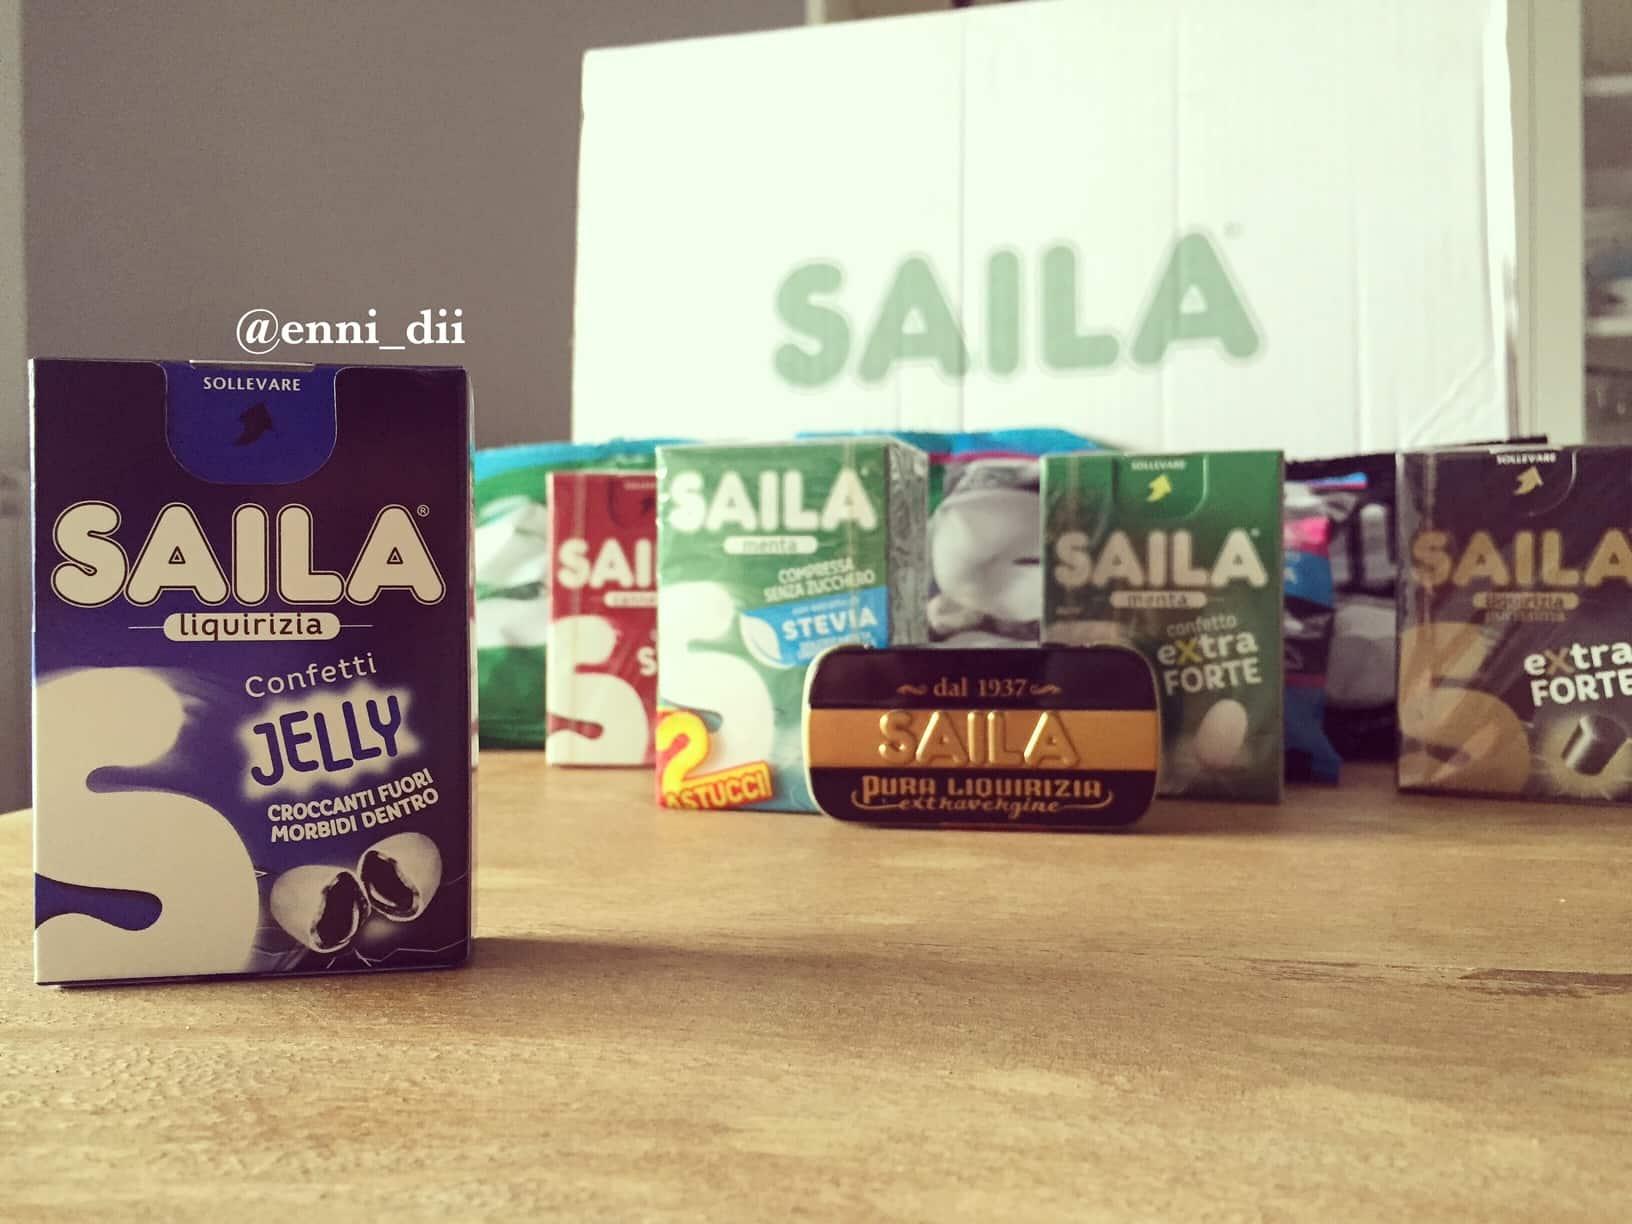 Benvenuti nel mondo : SAILA